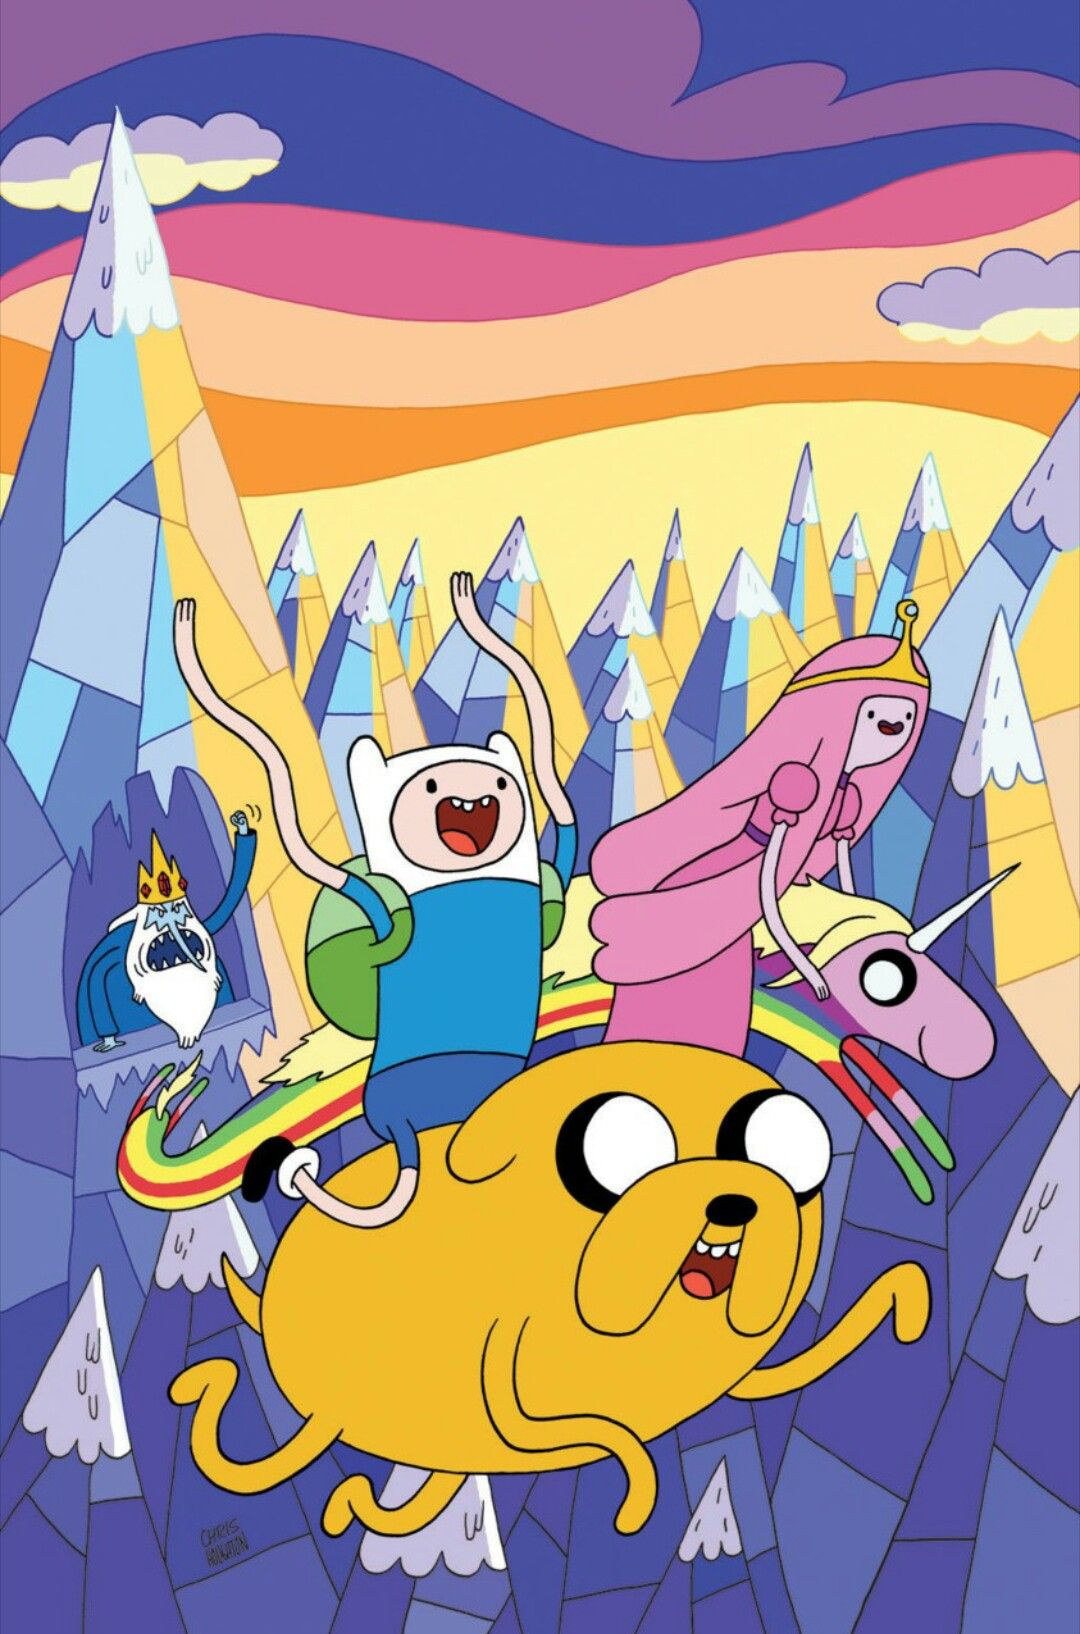 Pin by Akira 🎭 on Adventure Time ❤ | Pinterest